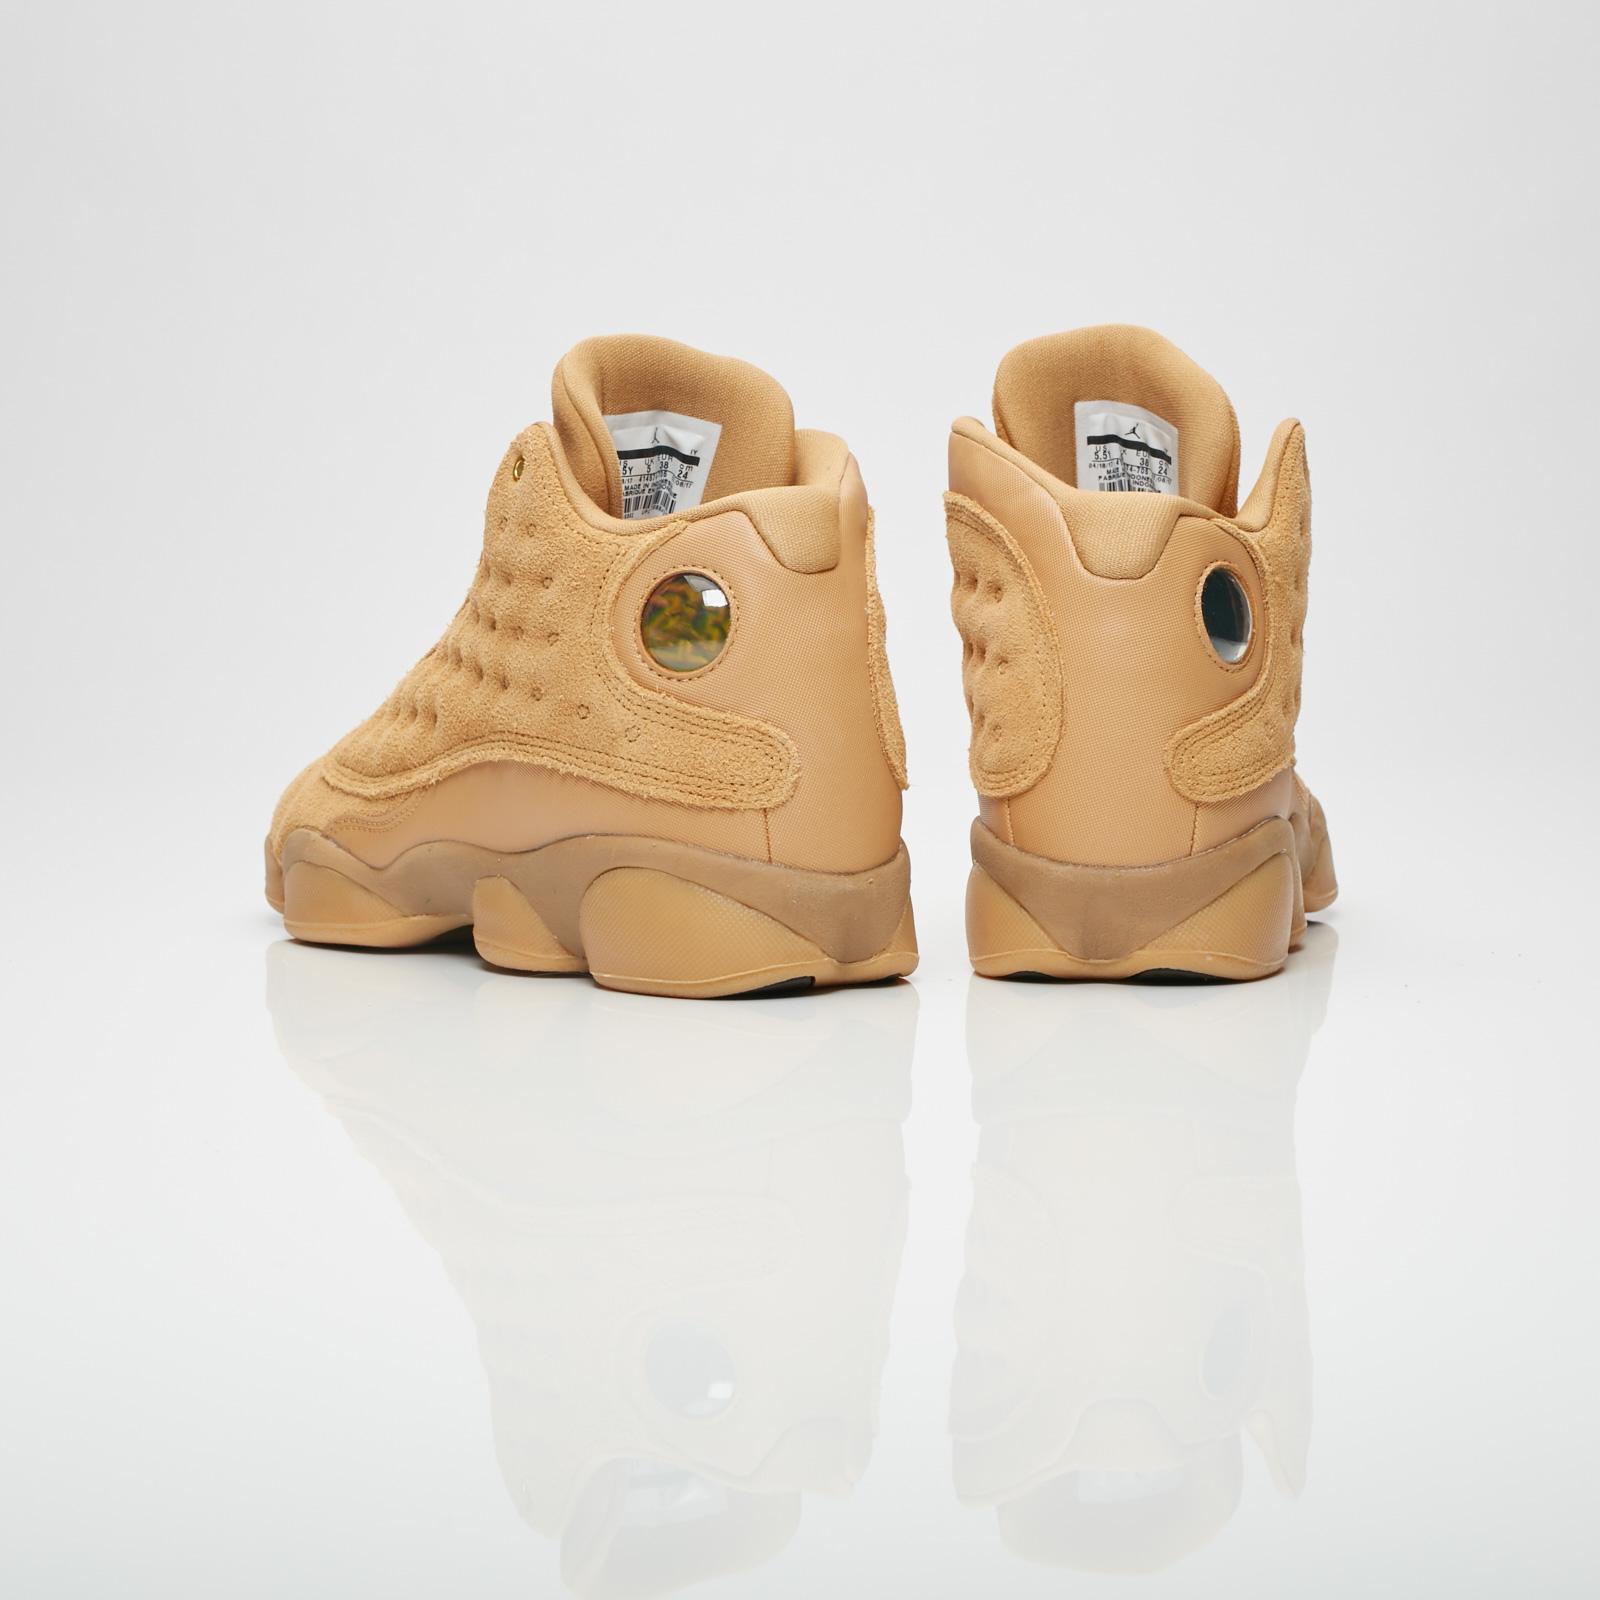 buy popular 6dfcf 6d3a2 Jordan Brand Air Jordan 13 Retro BG